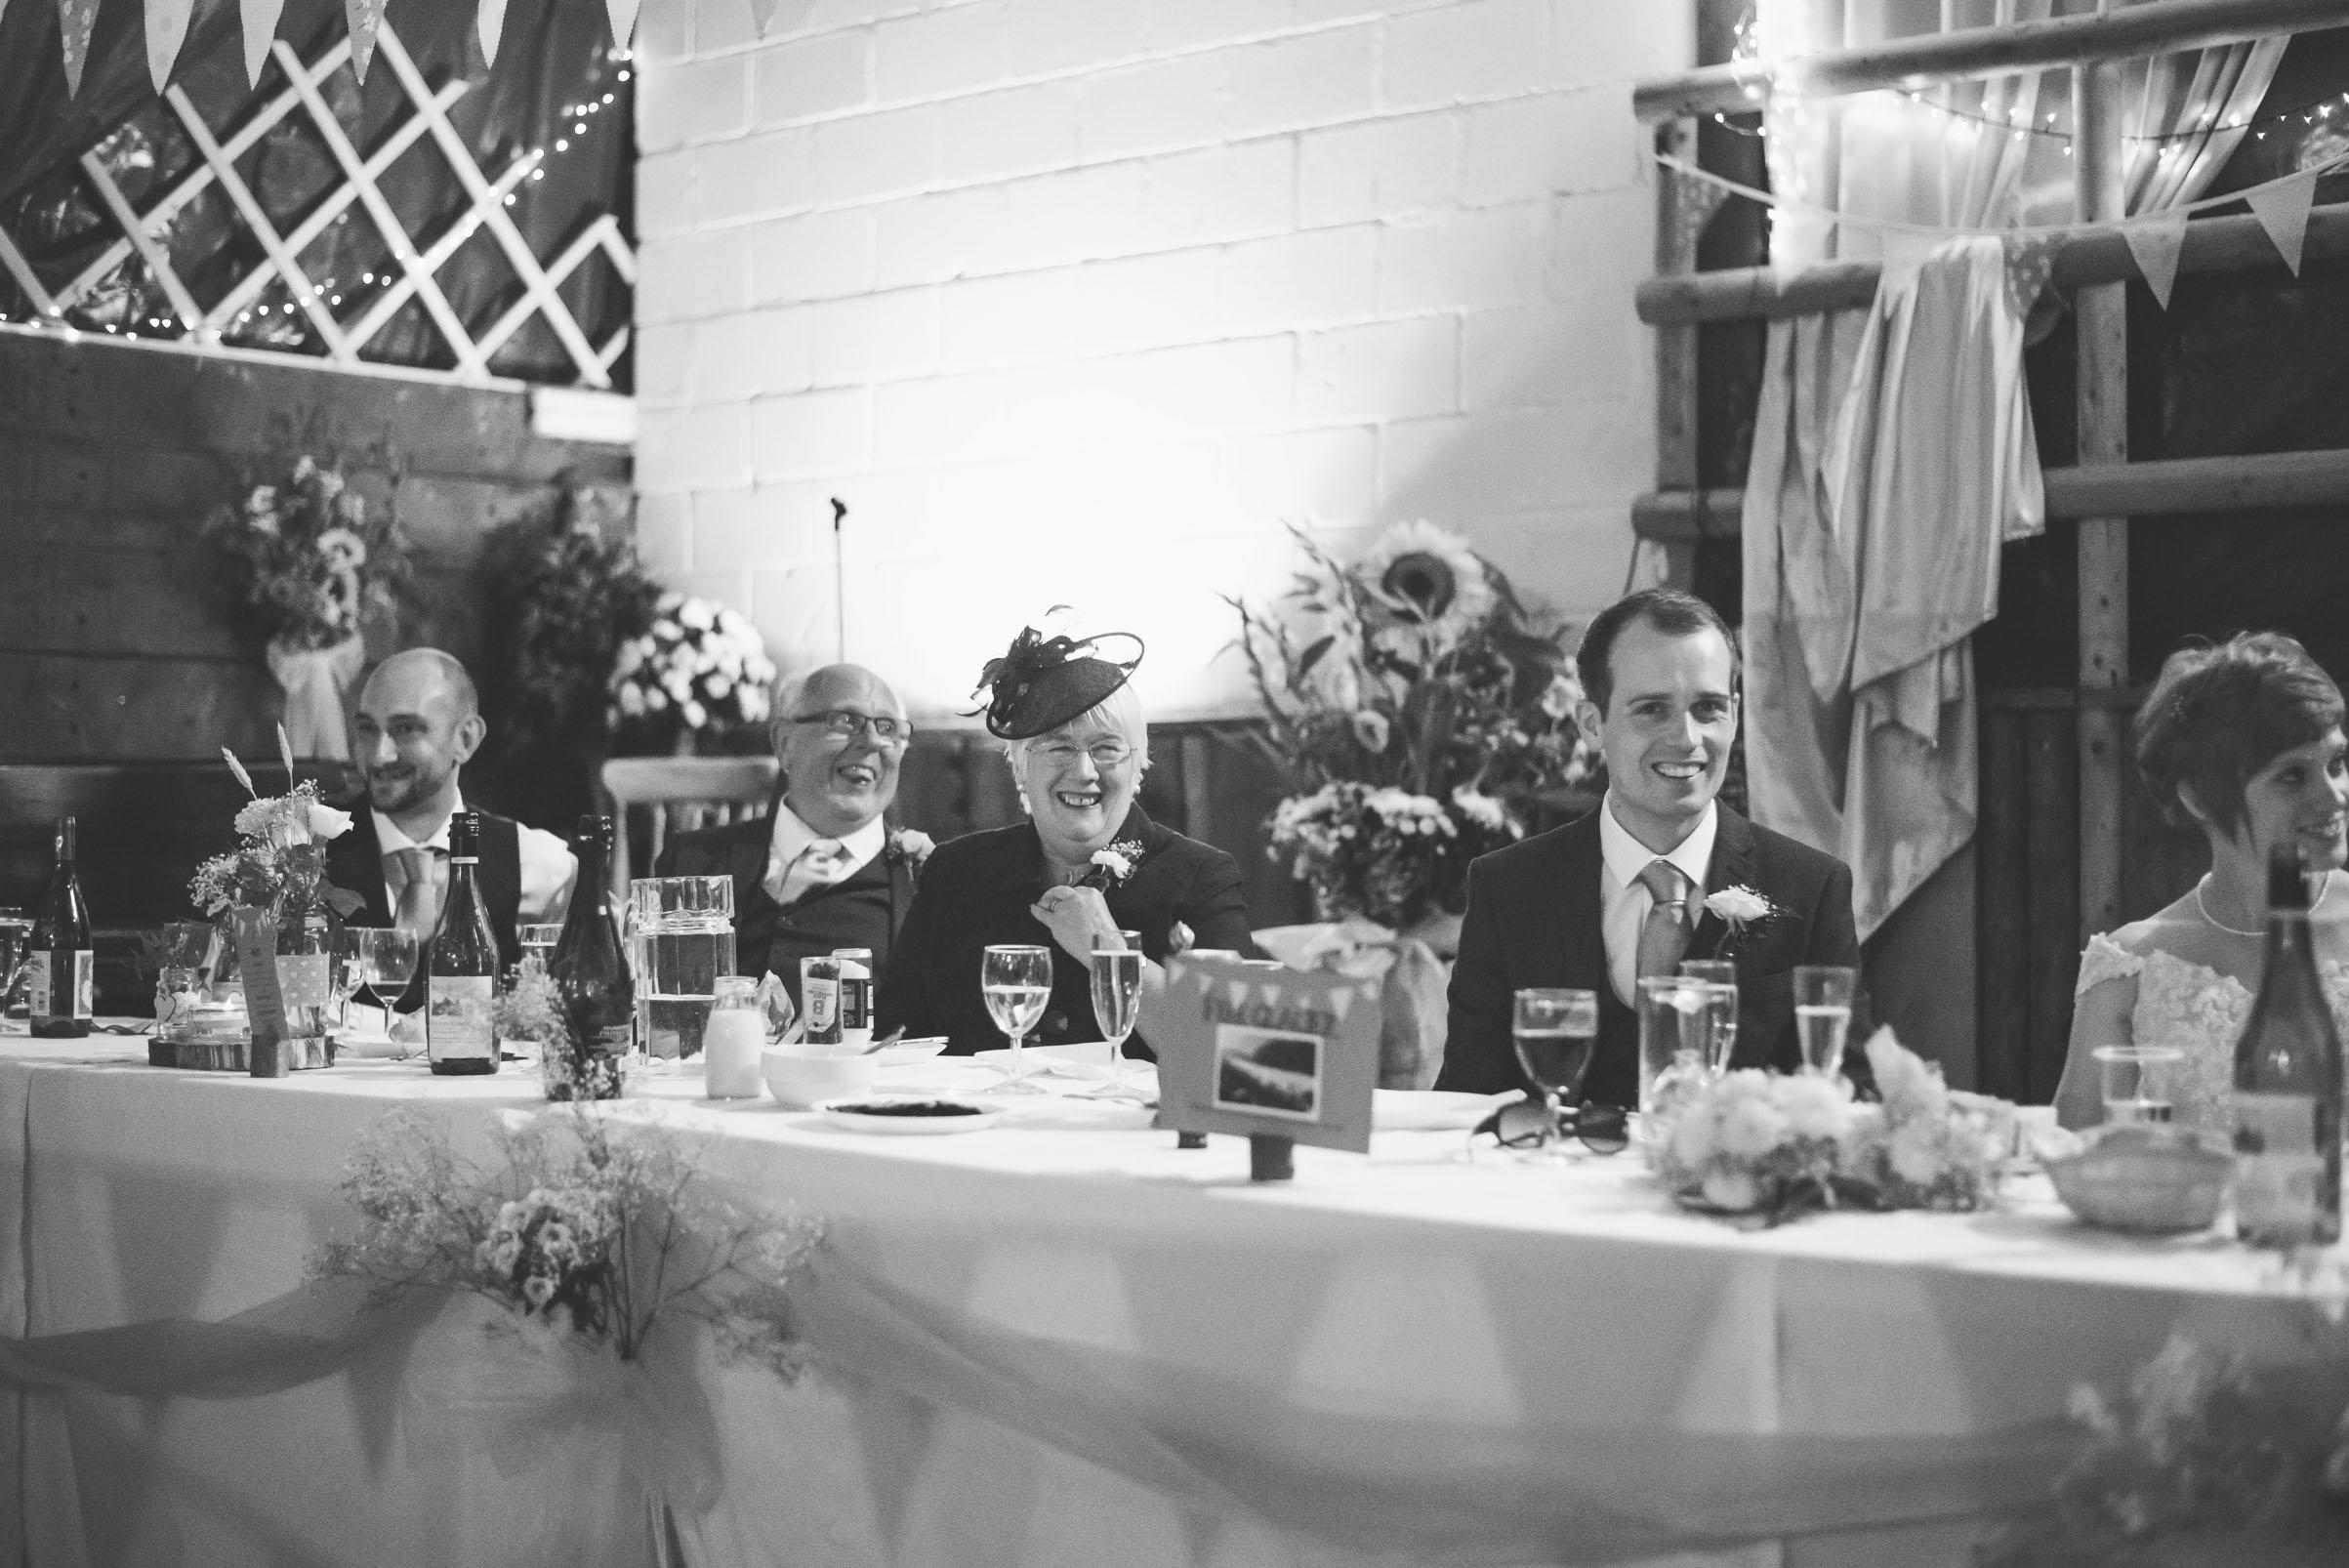 Peak+district+farm+wedding+lower+damgate+photographer-214.jpg